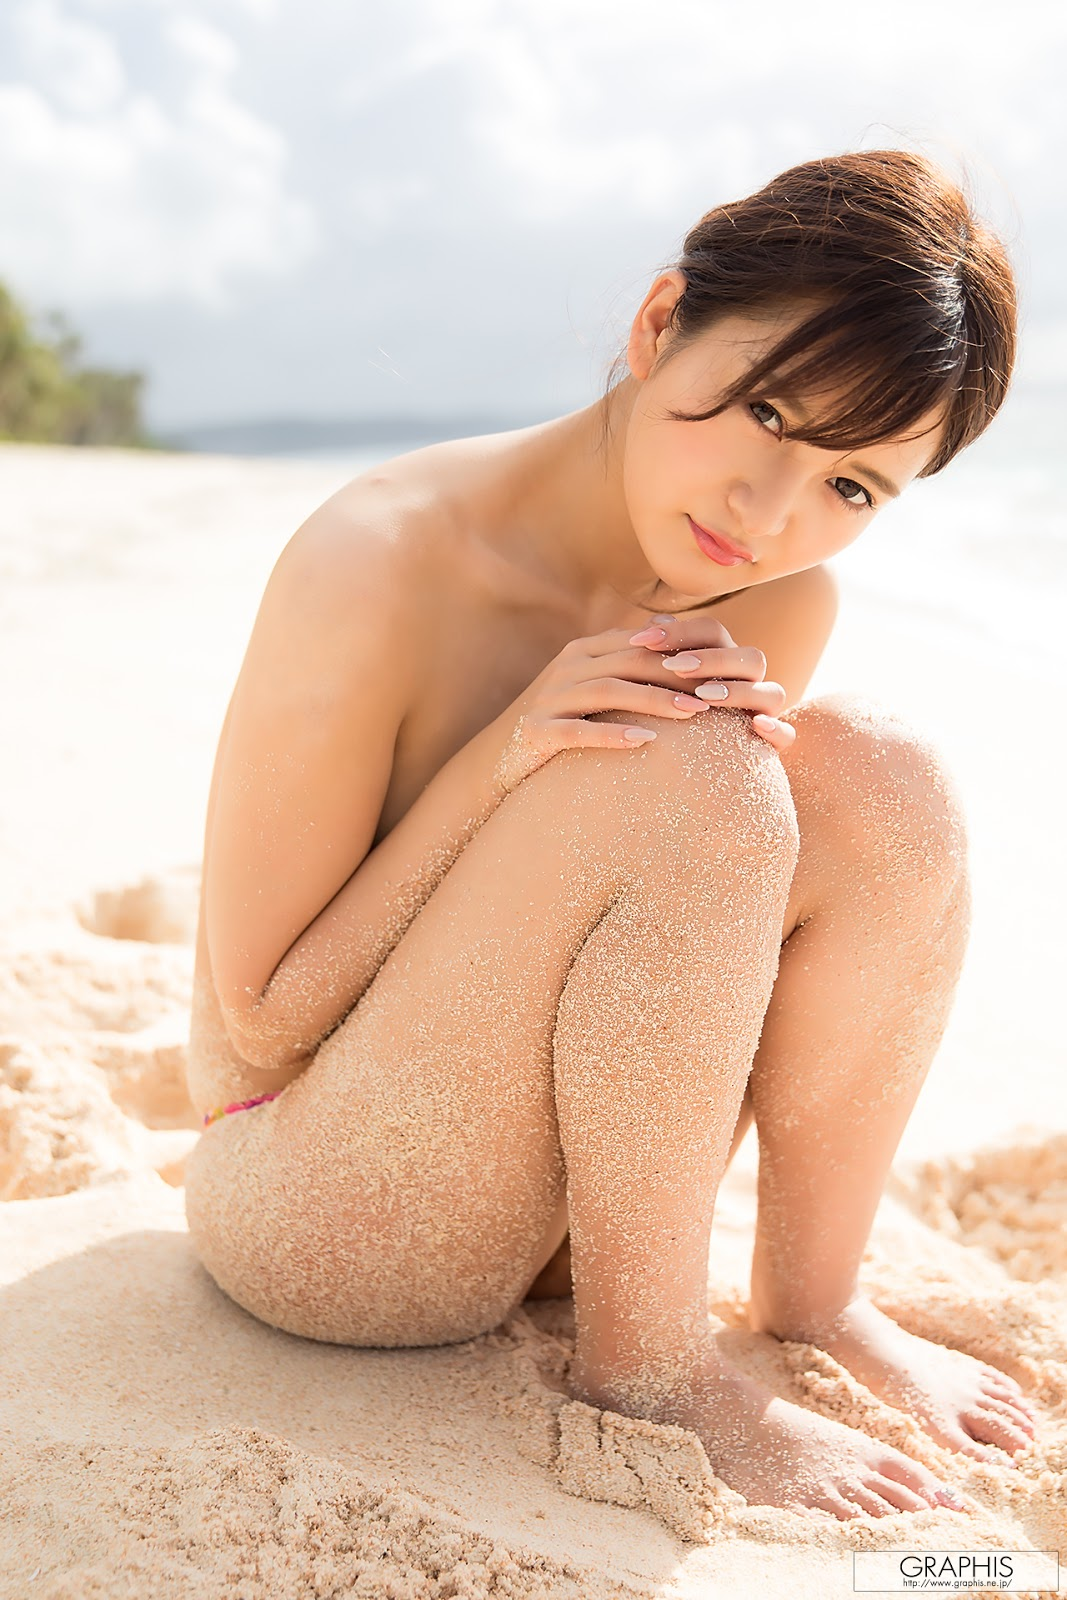 Sexinsex 极乐神教 赵丽颖 celebfake